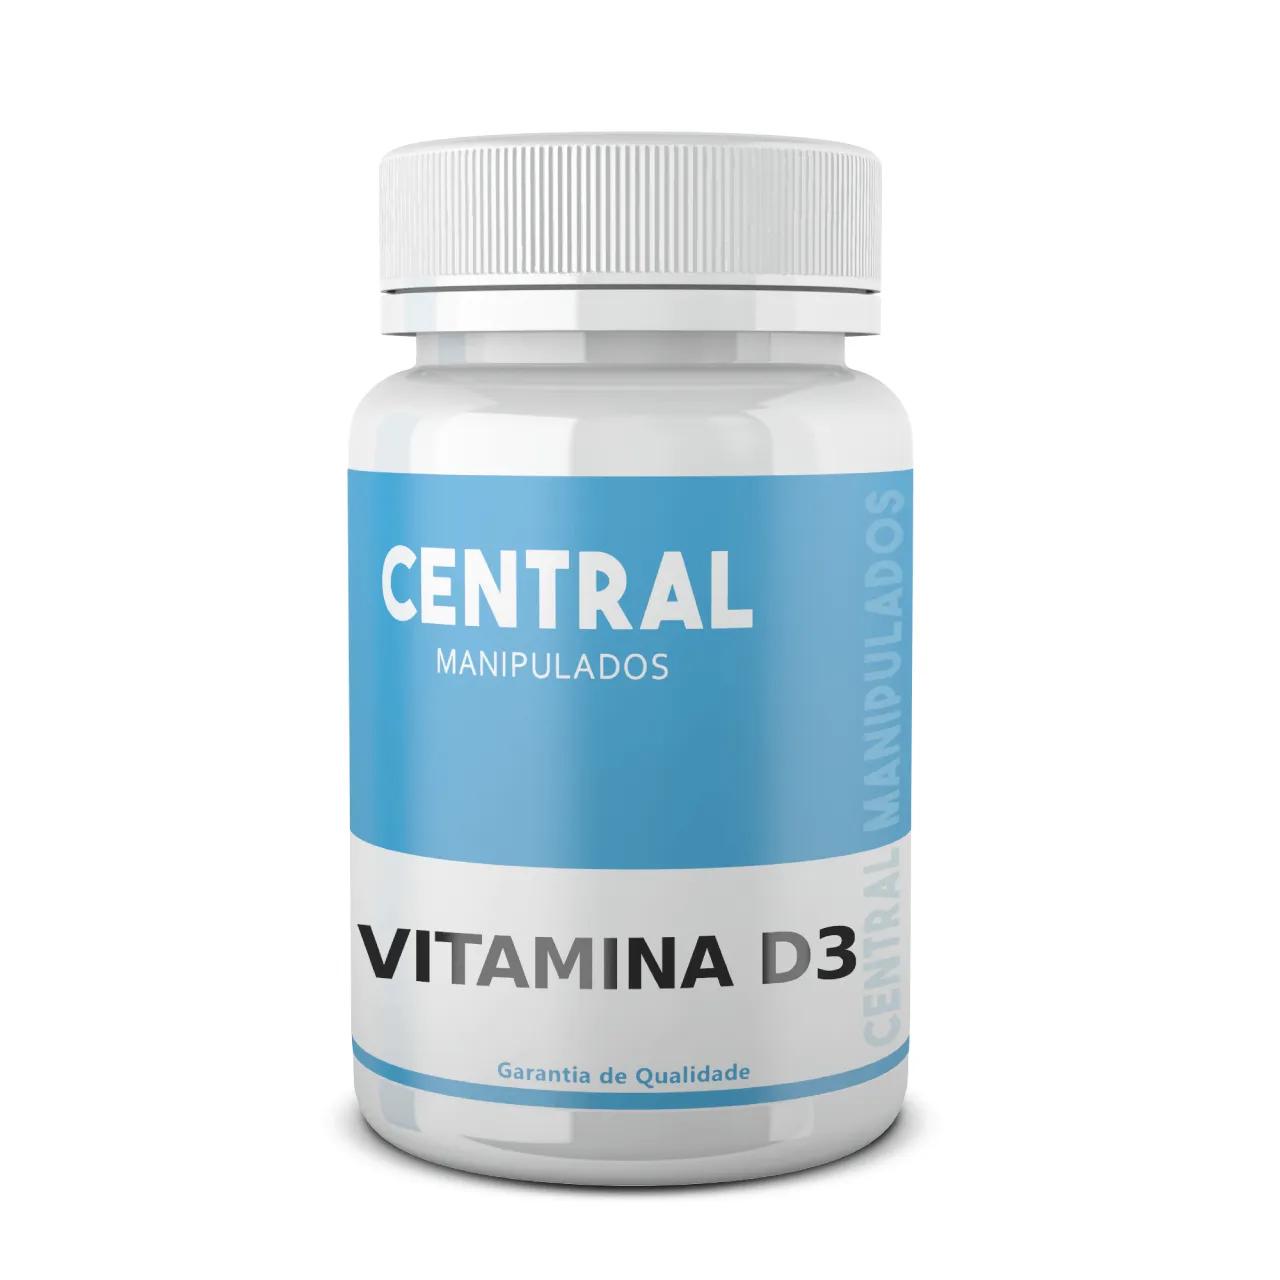 Vitamina D3 10.000 UI - 180 cápsulas - Saúde Óssea e Muscular